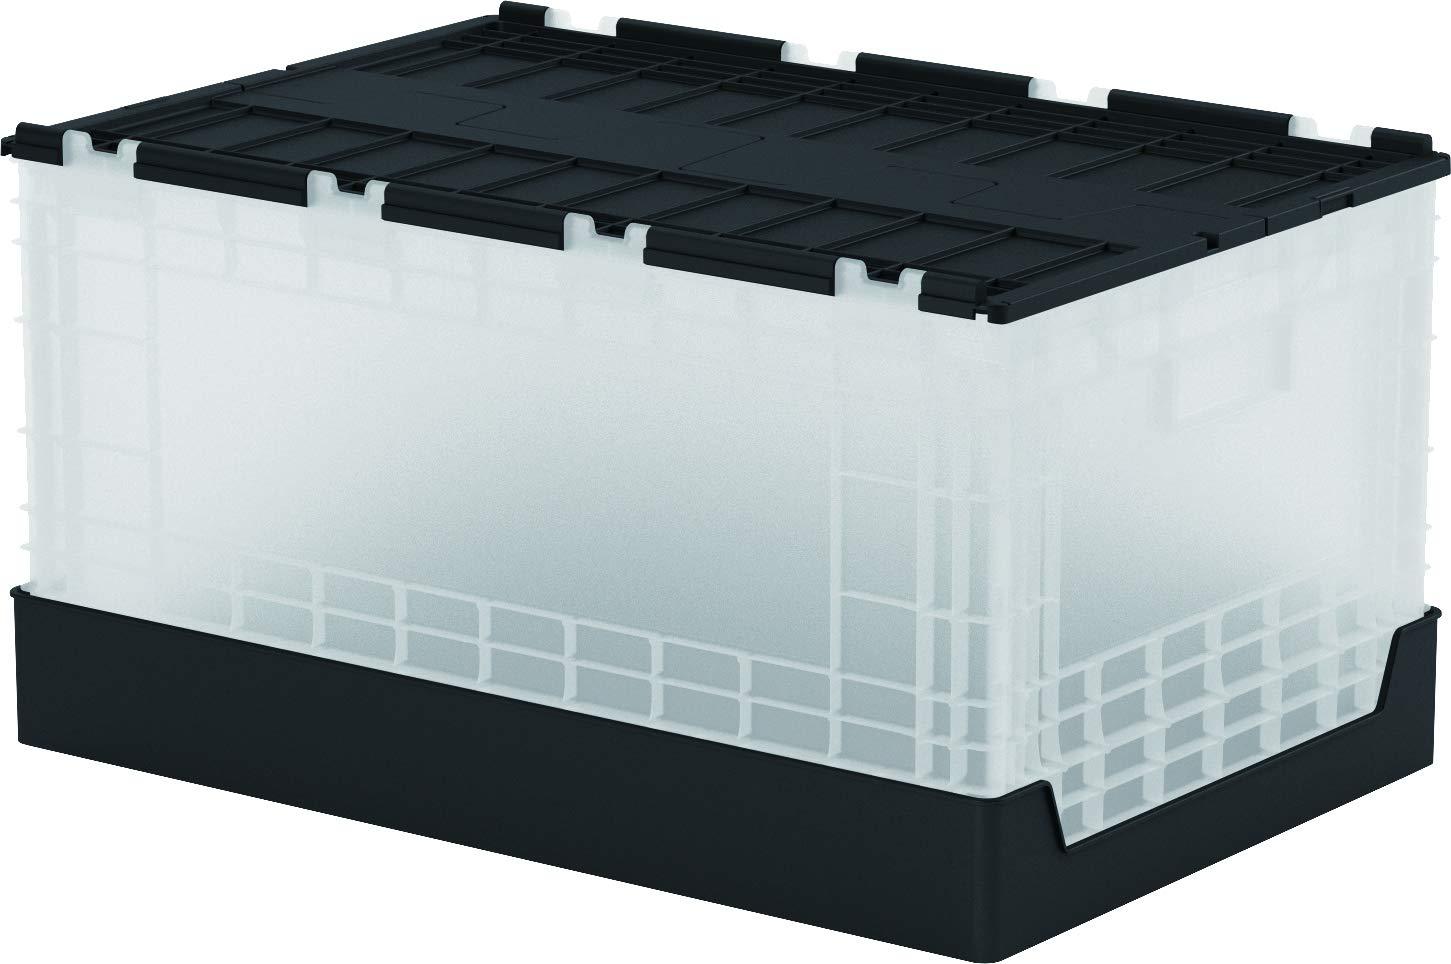 livinbox 58L Plegable Caja de Almacenamiento - Transparente: Amazon.es: Hogar